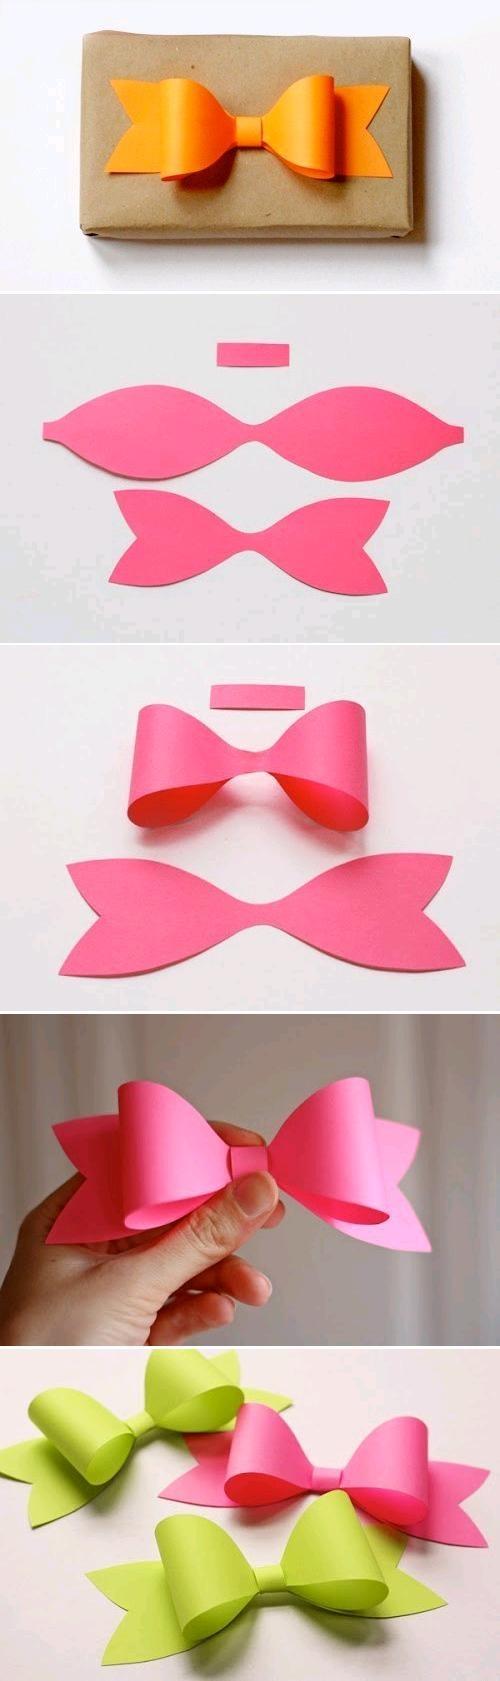 Modular Bow